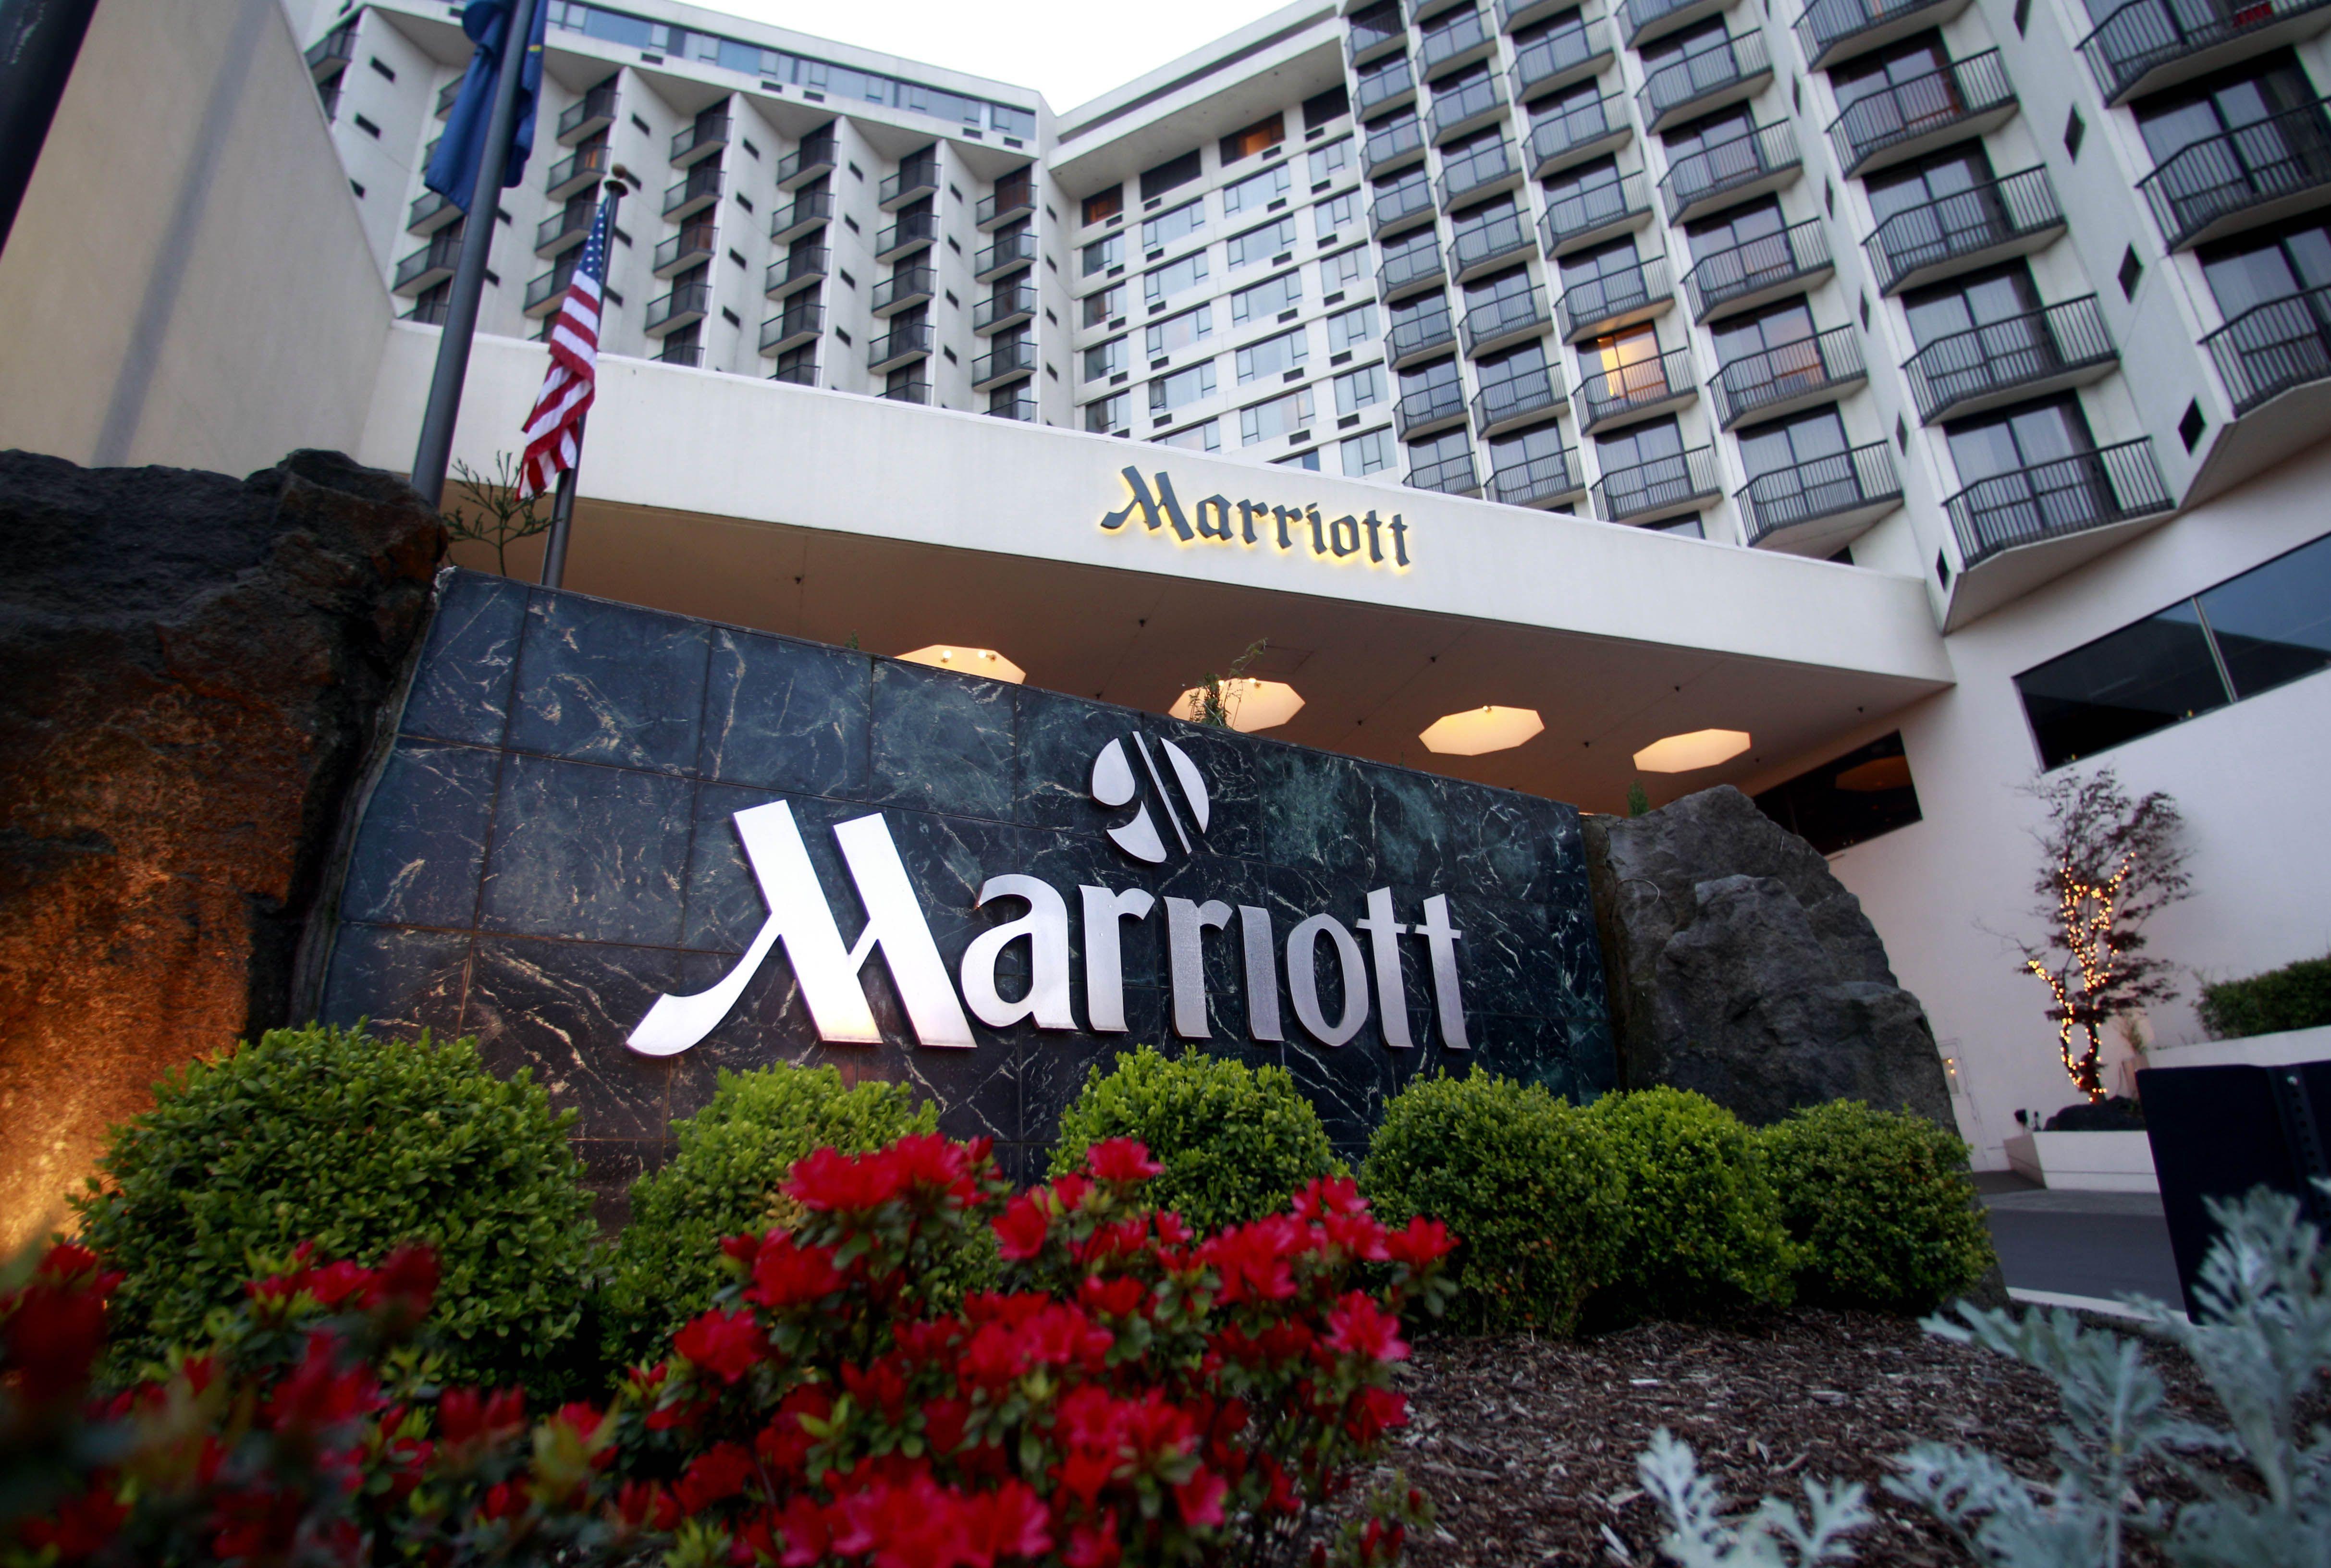 Marriott's commitment to Inbound Marketing through being unforgettable and effortless.